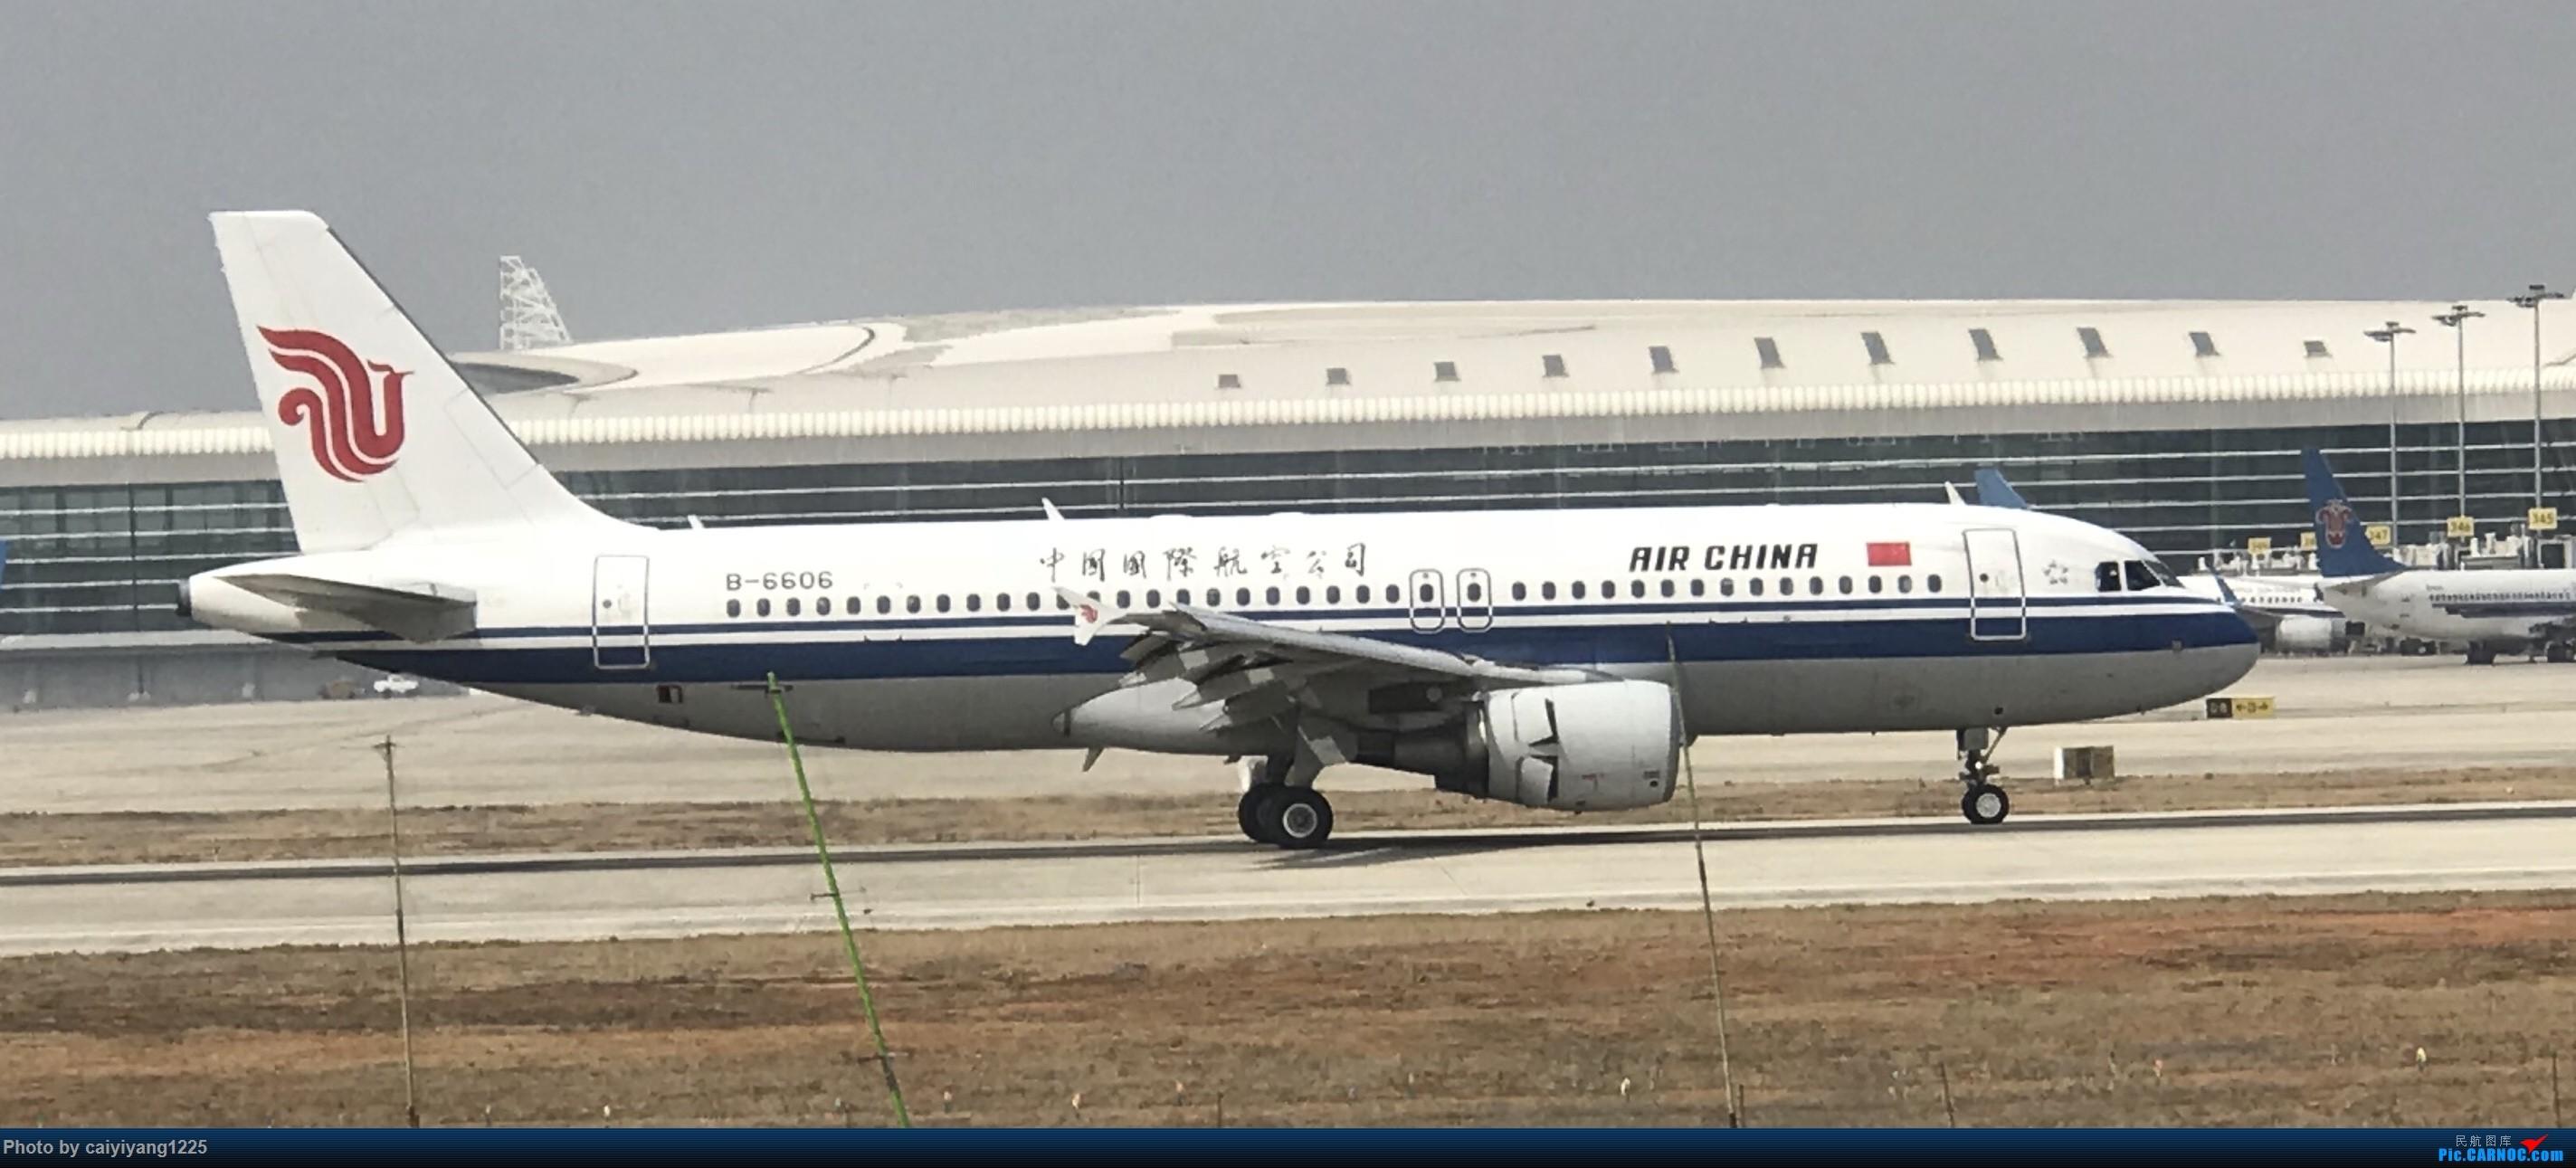 Re:[原创]武汉国庆拍机ps:出门忘带相机 拿手机拍的烂货请见谅! AIRBUS A320-200 B-6608 武汉天河国际机场